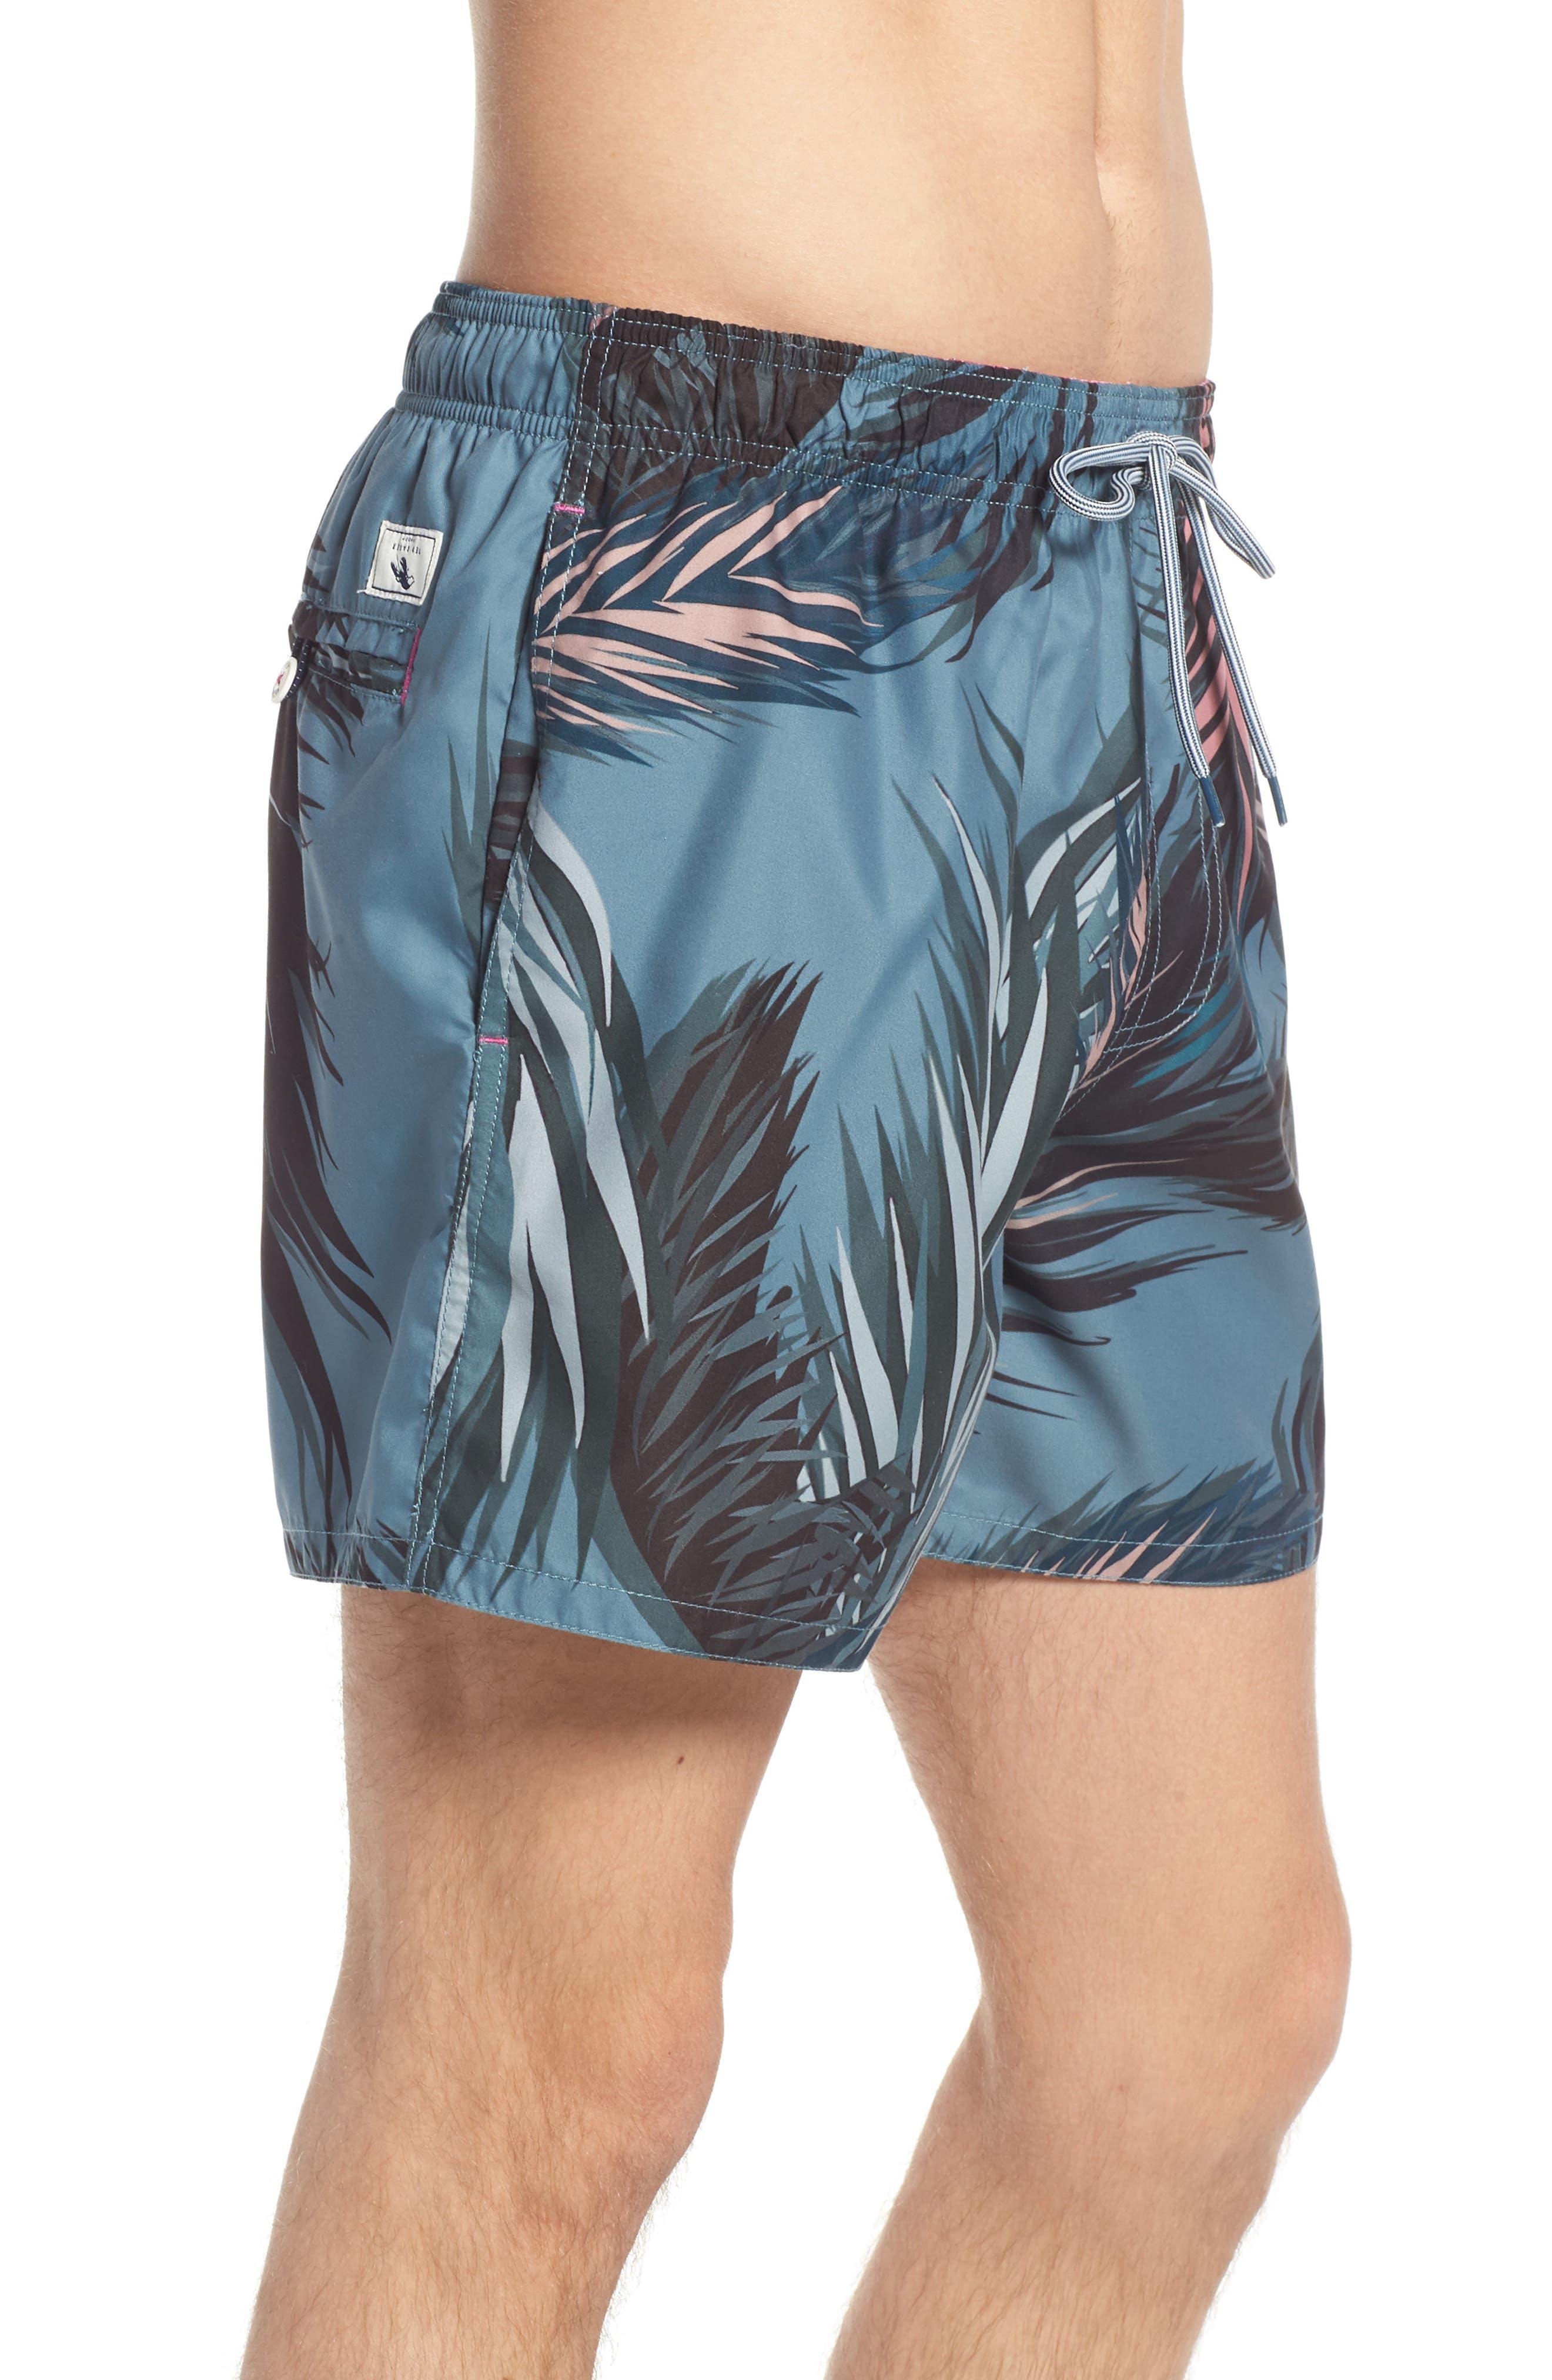 Raynebo Slim Fit Palm Leaf Swim Trunks,                             Alternate thumbnail 3, color,                             301